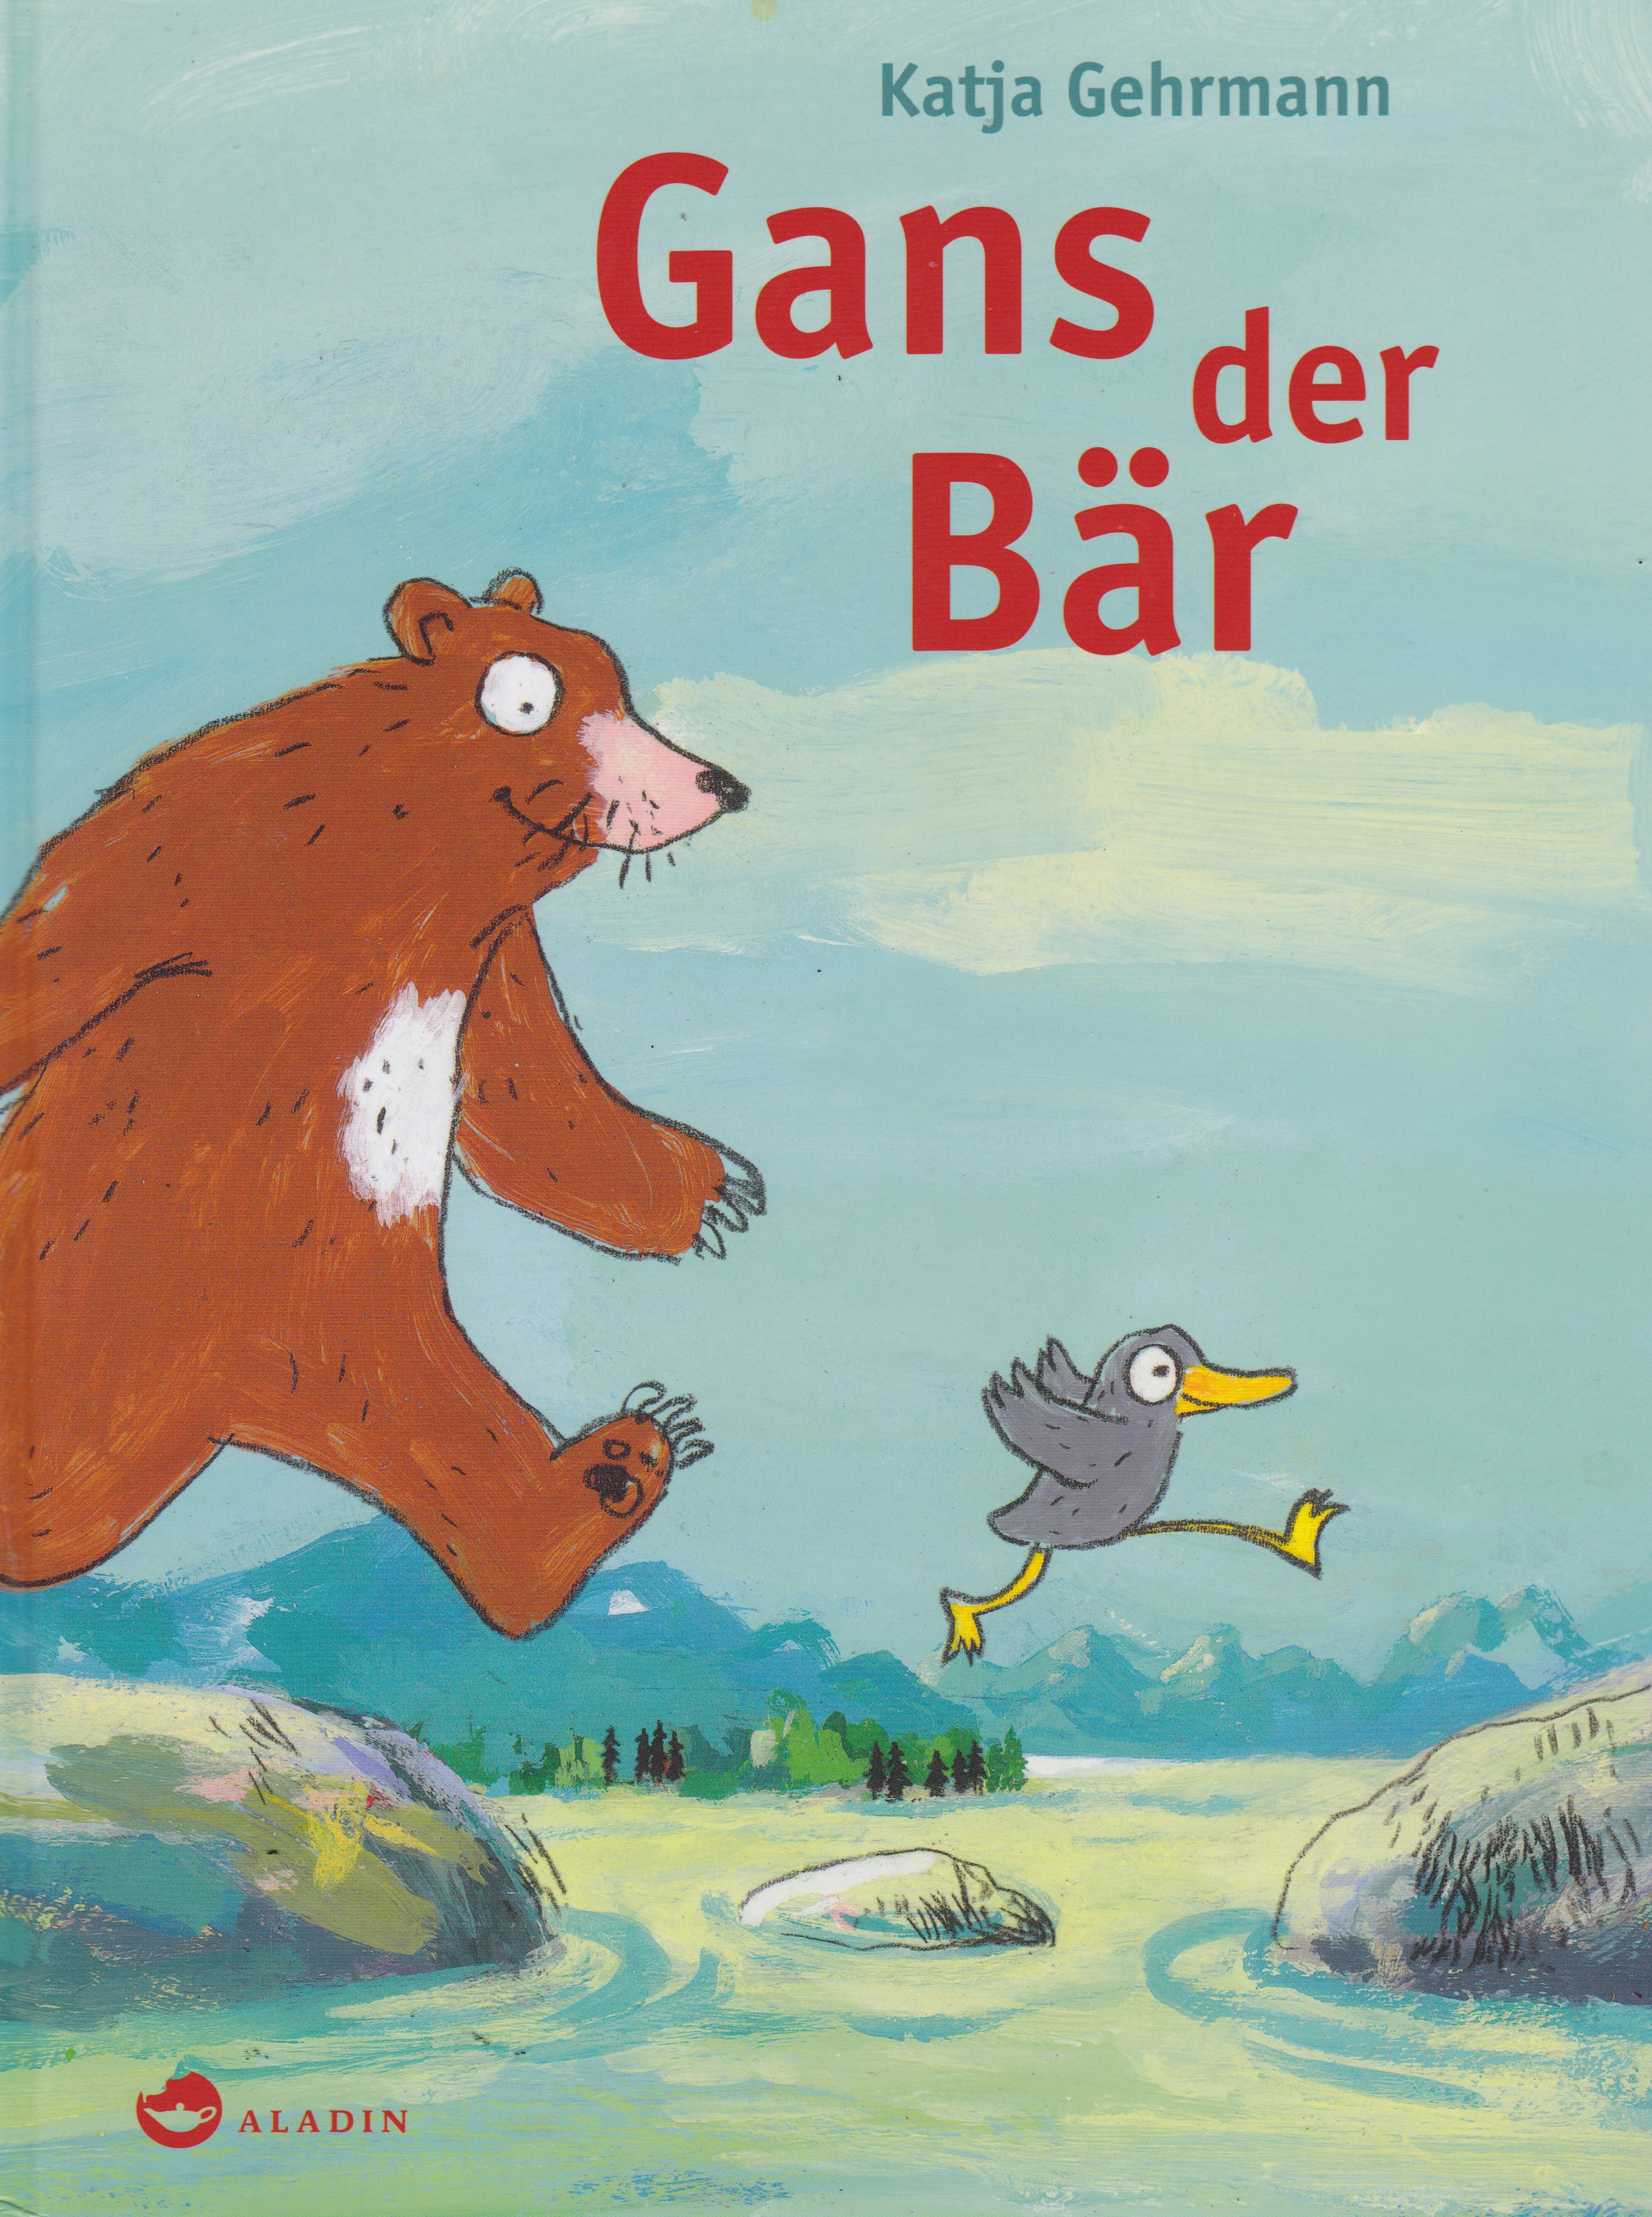 Gans der Bär Book Cover